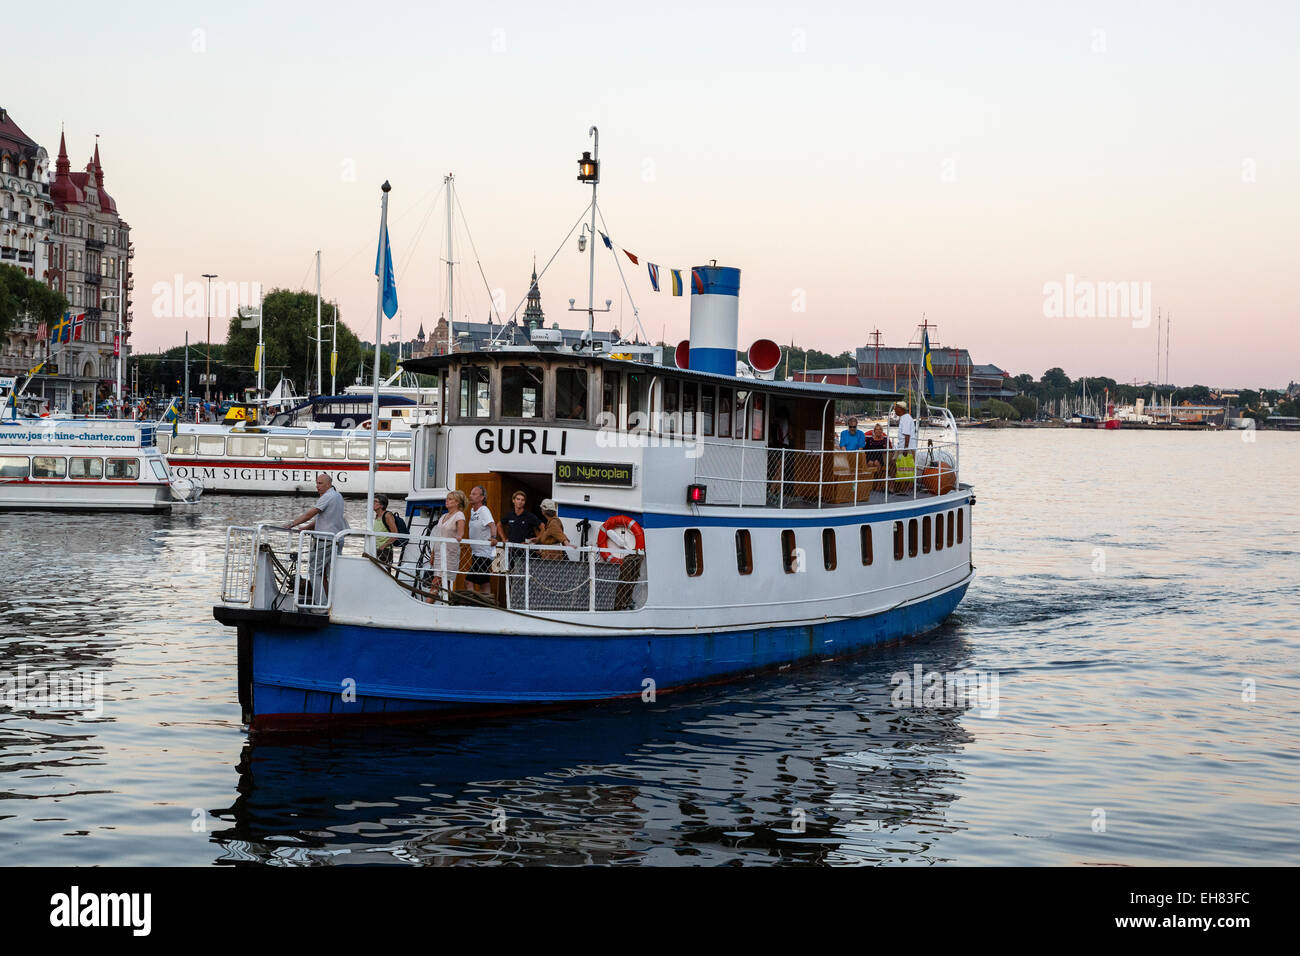 Public transport ferry, Stockholm, Sweden, Scandinavia, Europe - Stock Image